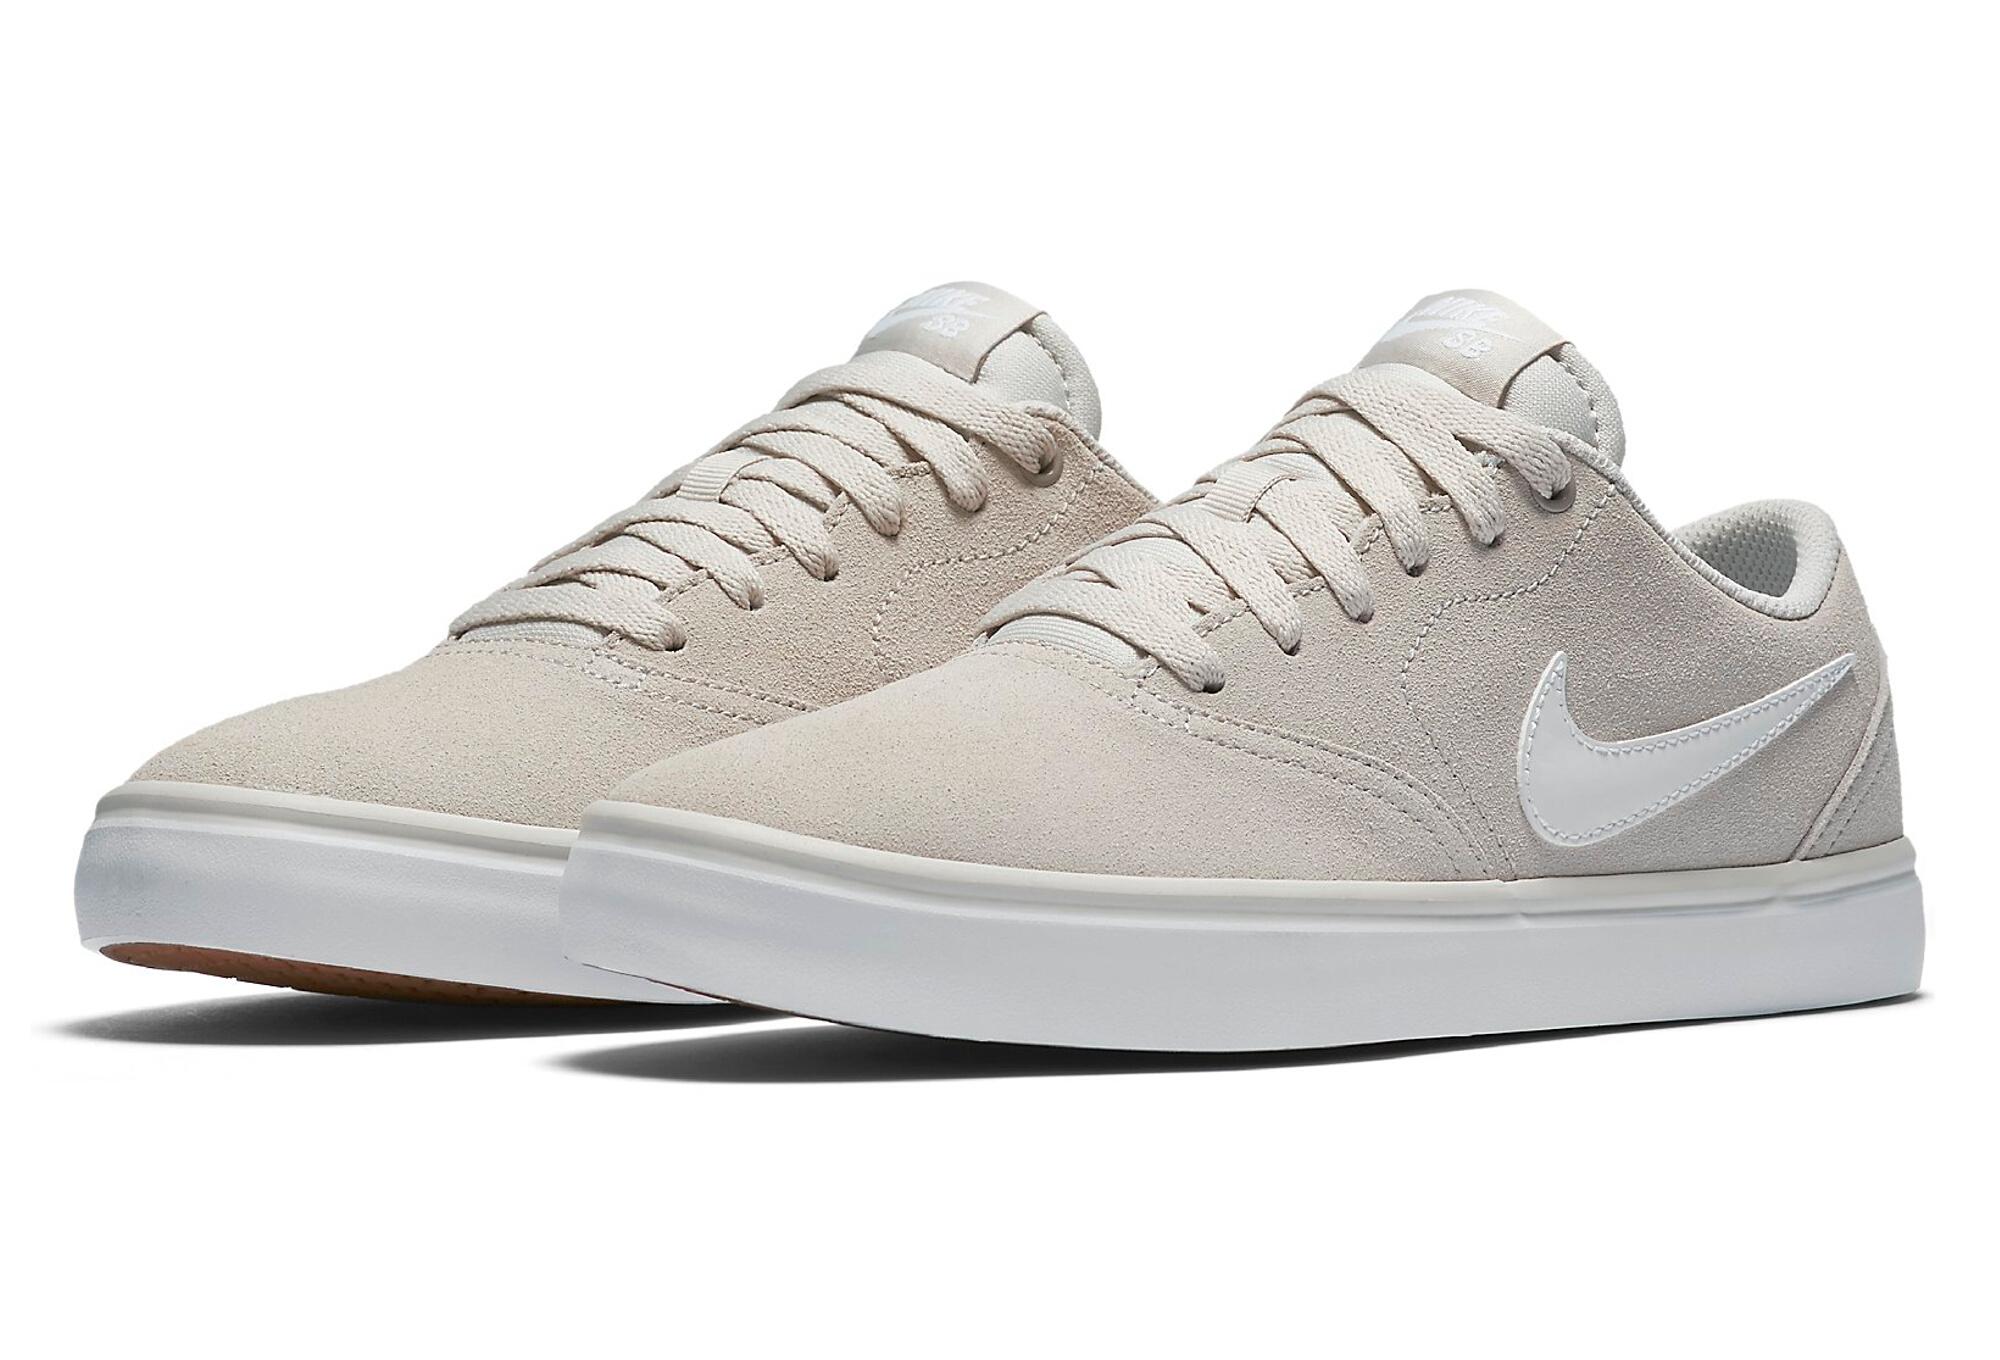 Nike SB Check Solarsoft Schuhe Beige Weiß